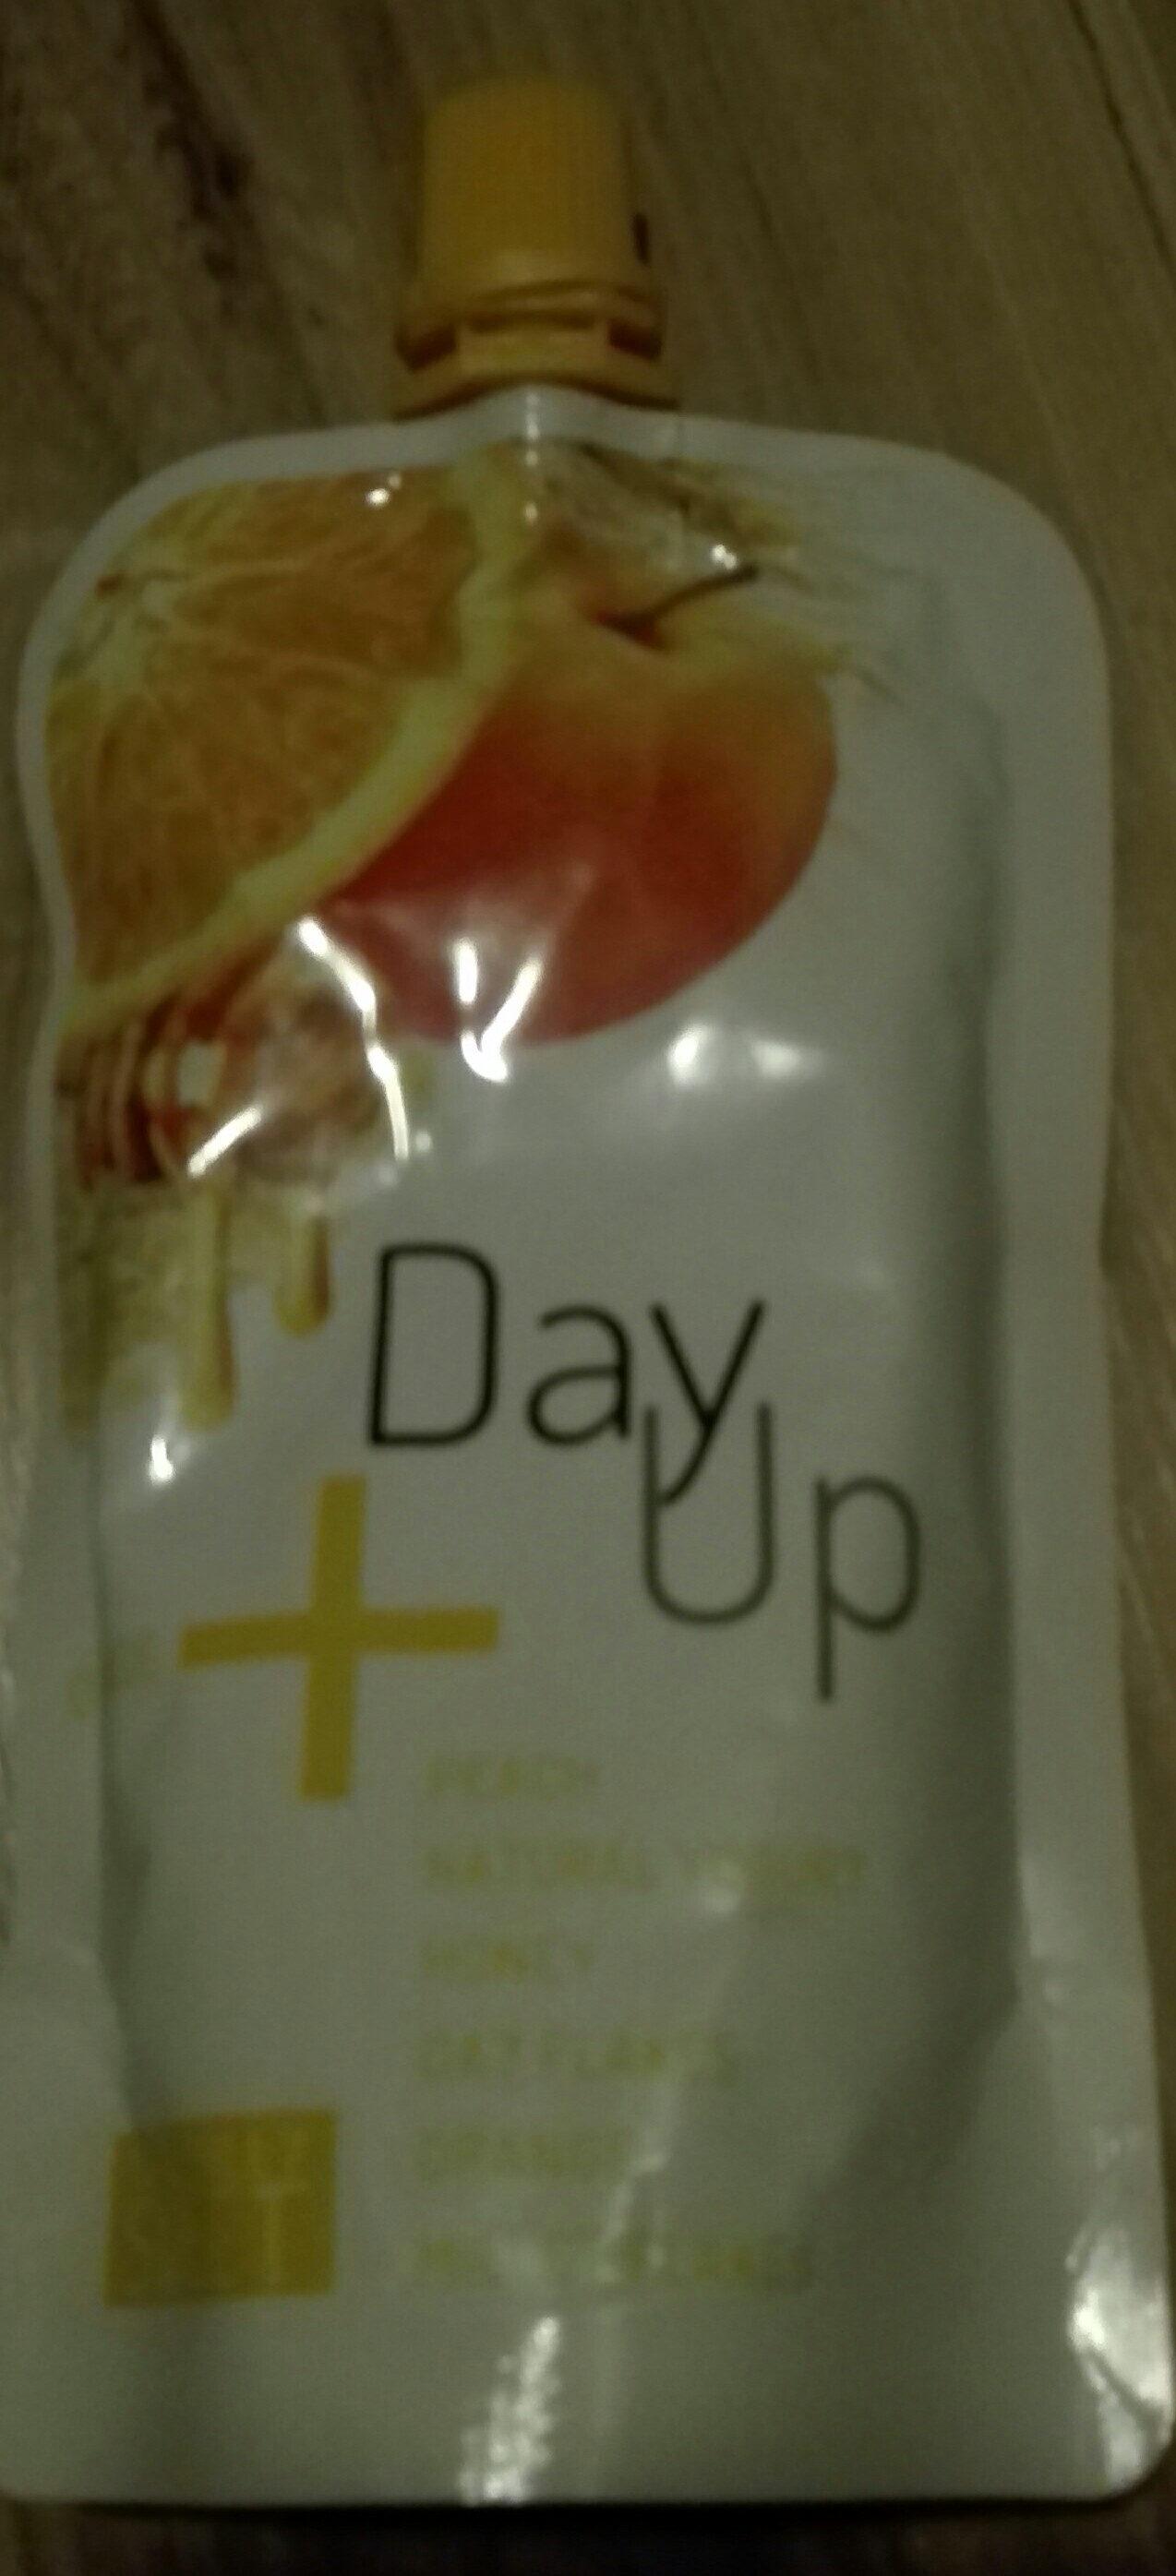 DayUp - Produkt